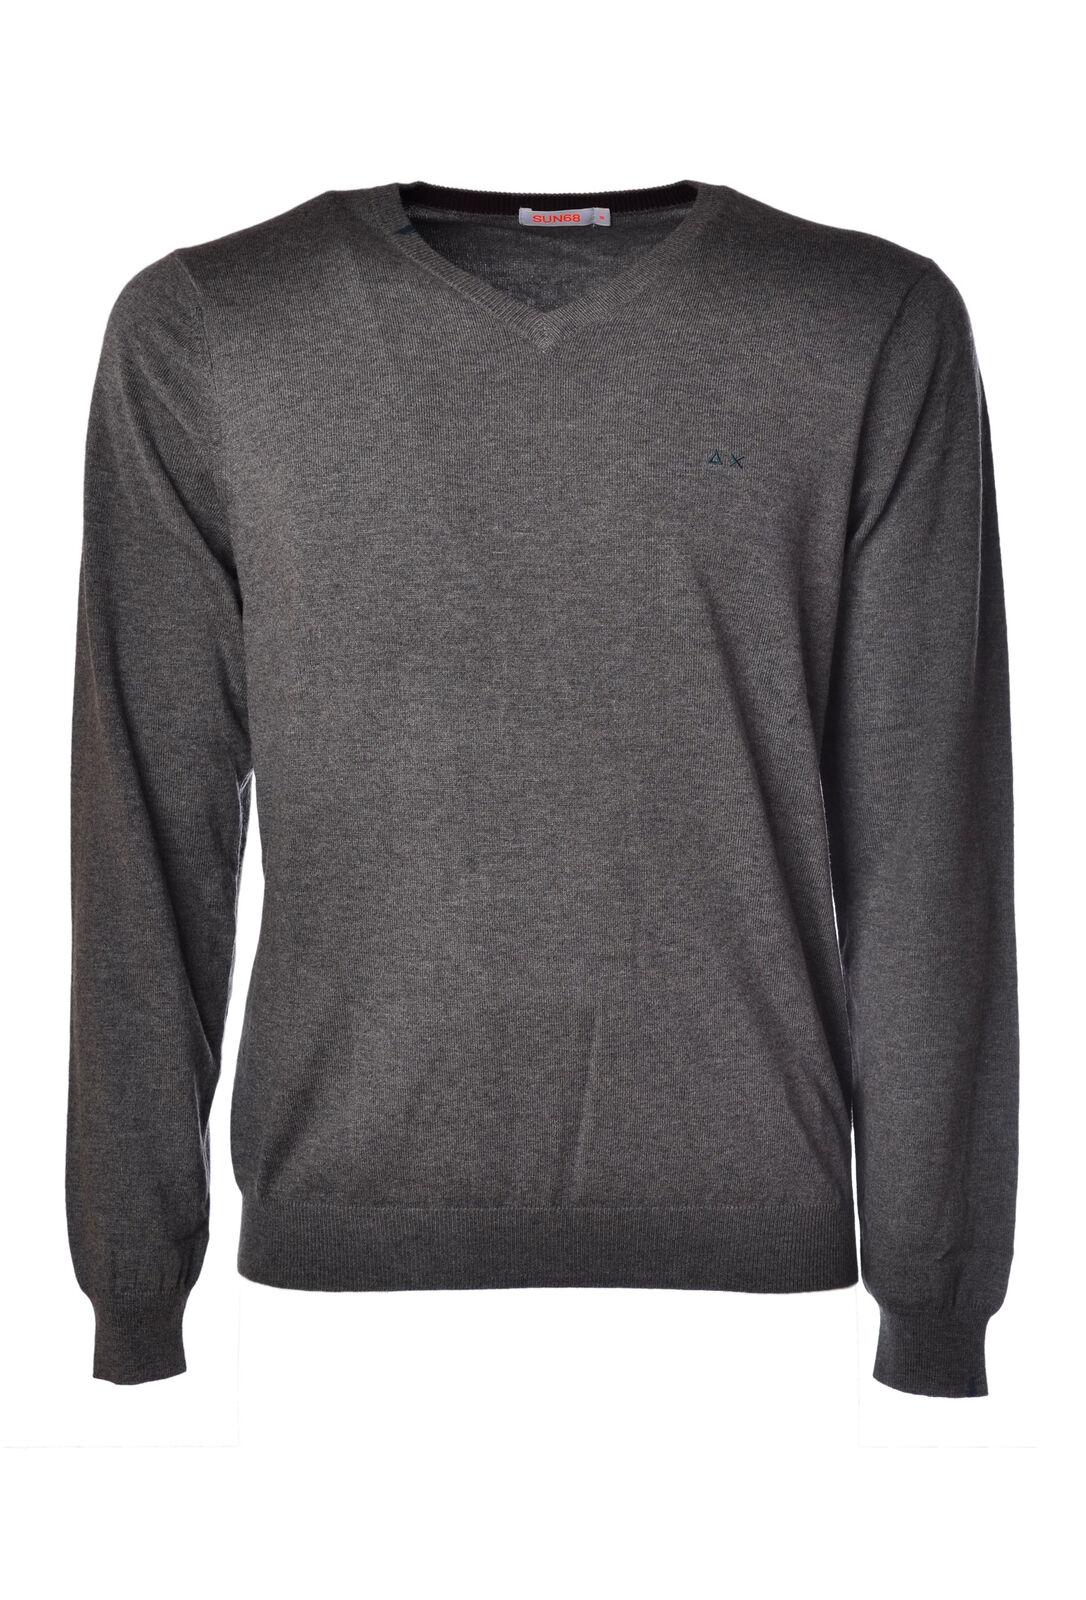 Sun 68 - Knitwear-Sweaters - Man - Grey - 922718C182122